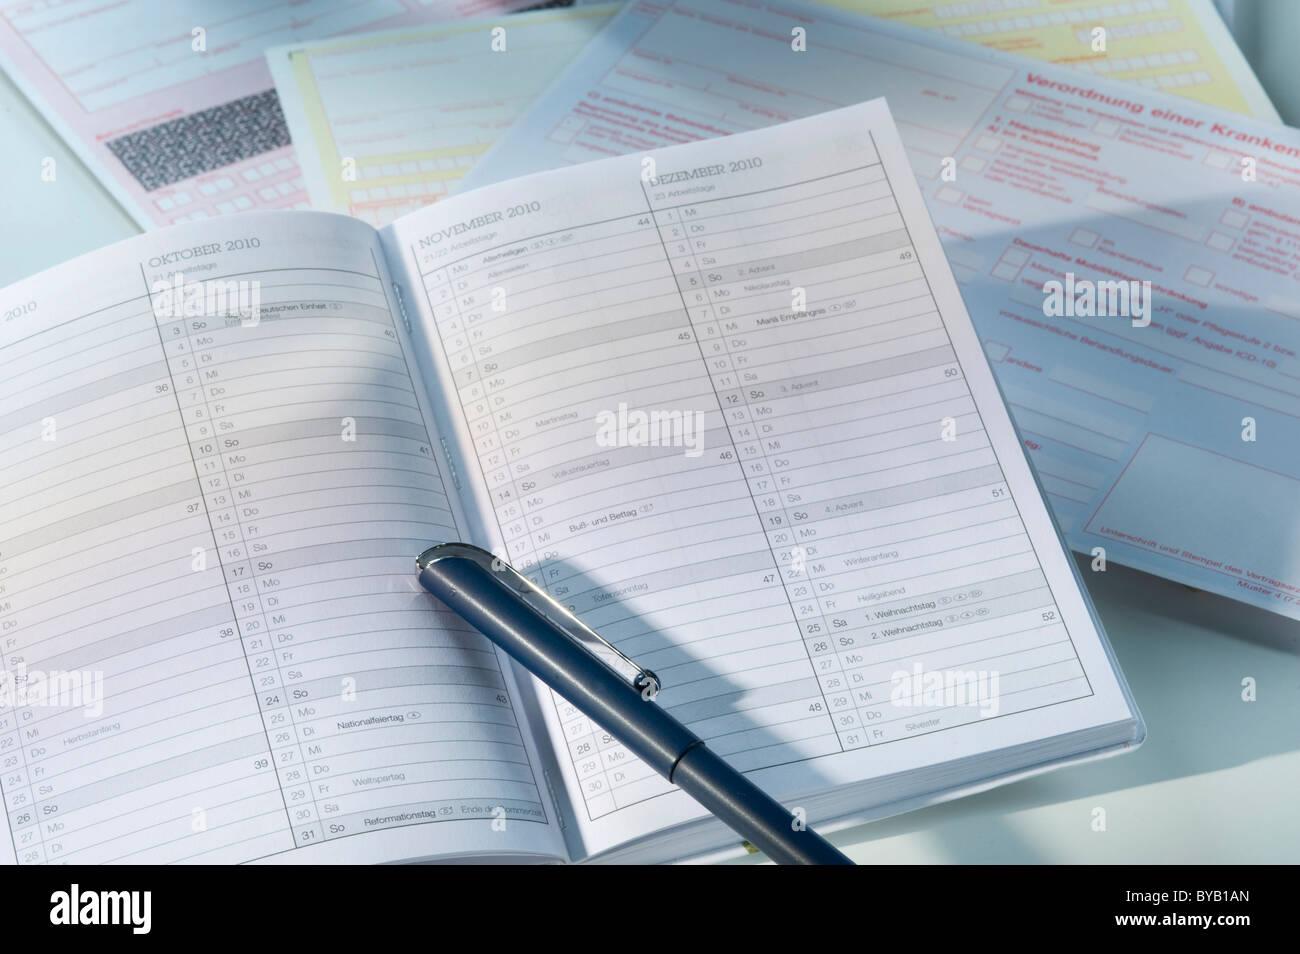 Diary, calendar - Stock Image